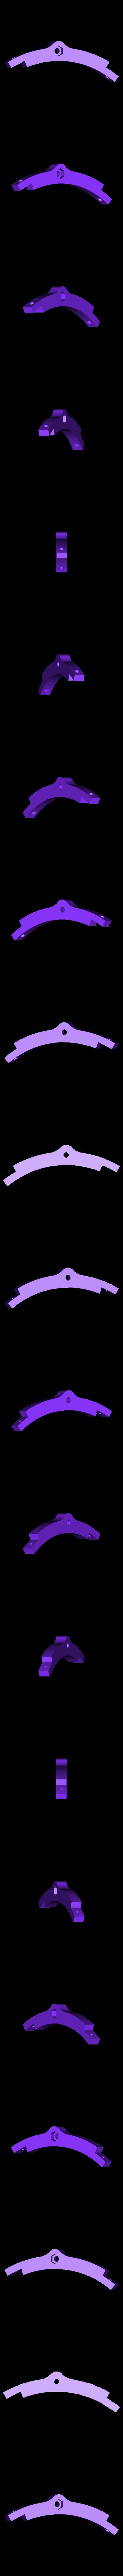 rim.stl Download free STL file 8 inch e-drum pad with small 3d printer • 3D printing object, RyoKosaka